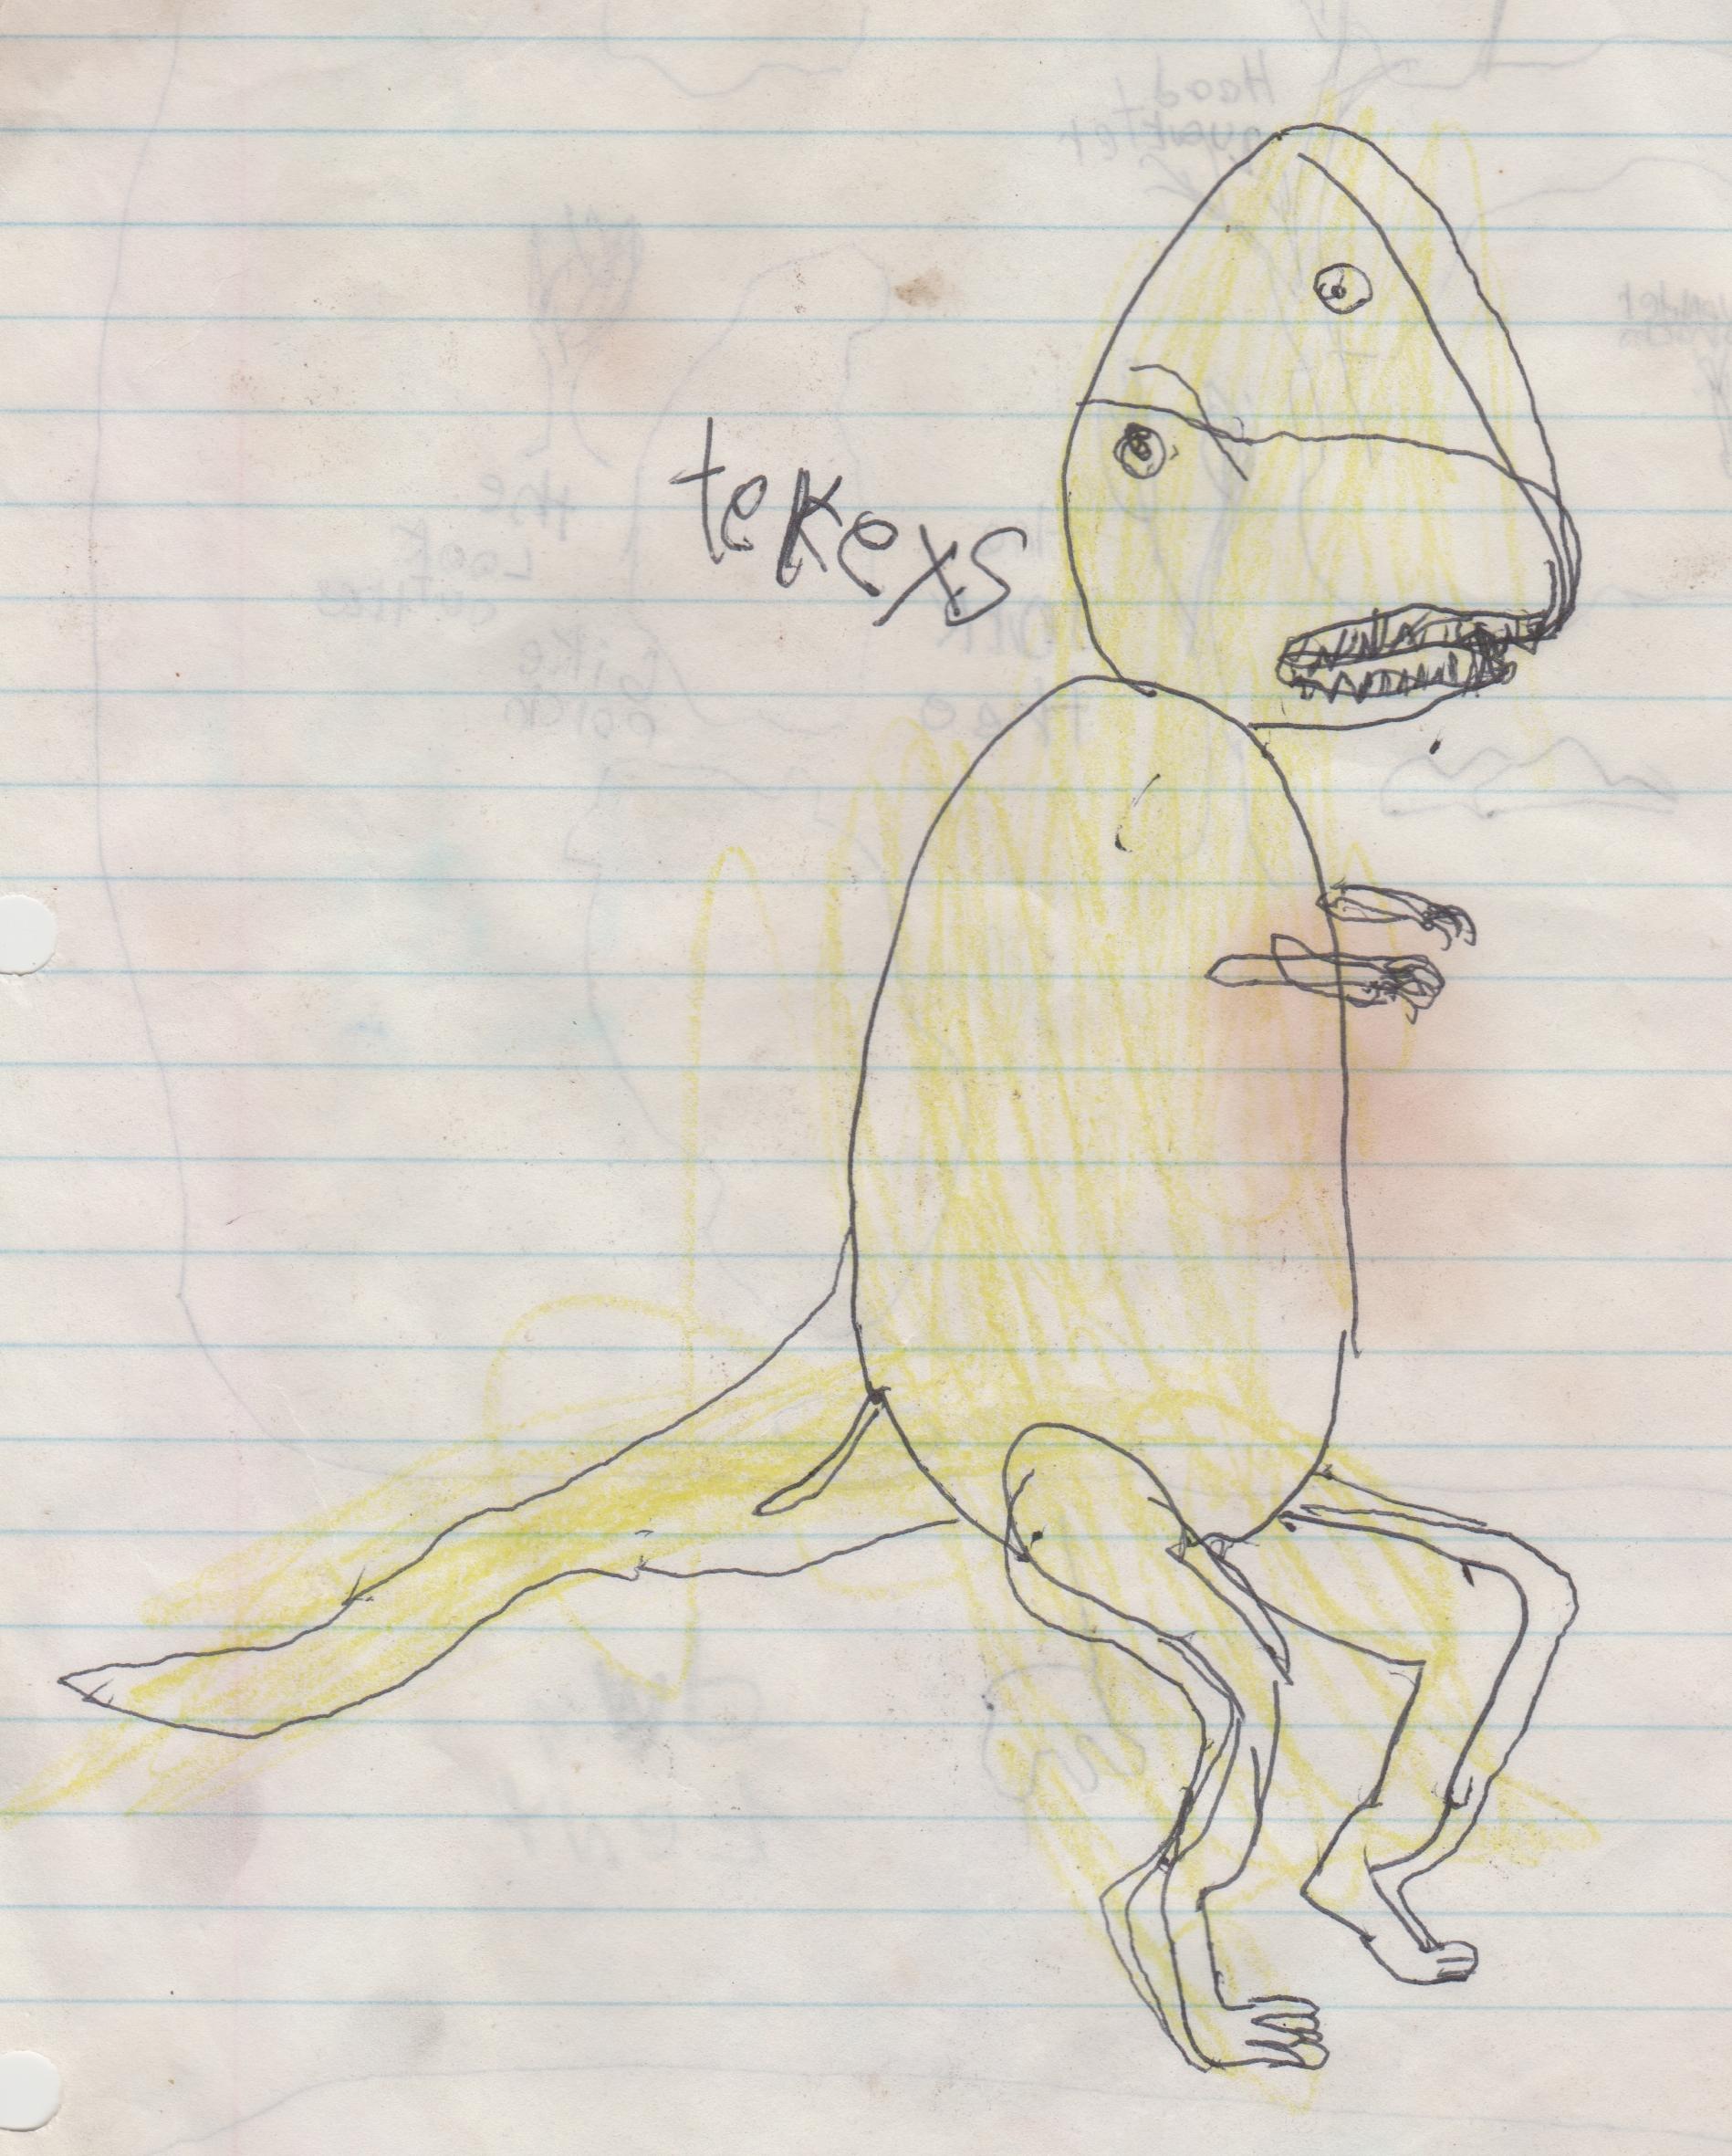 1995 maybe - T-rex.jpg